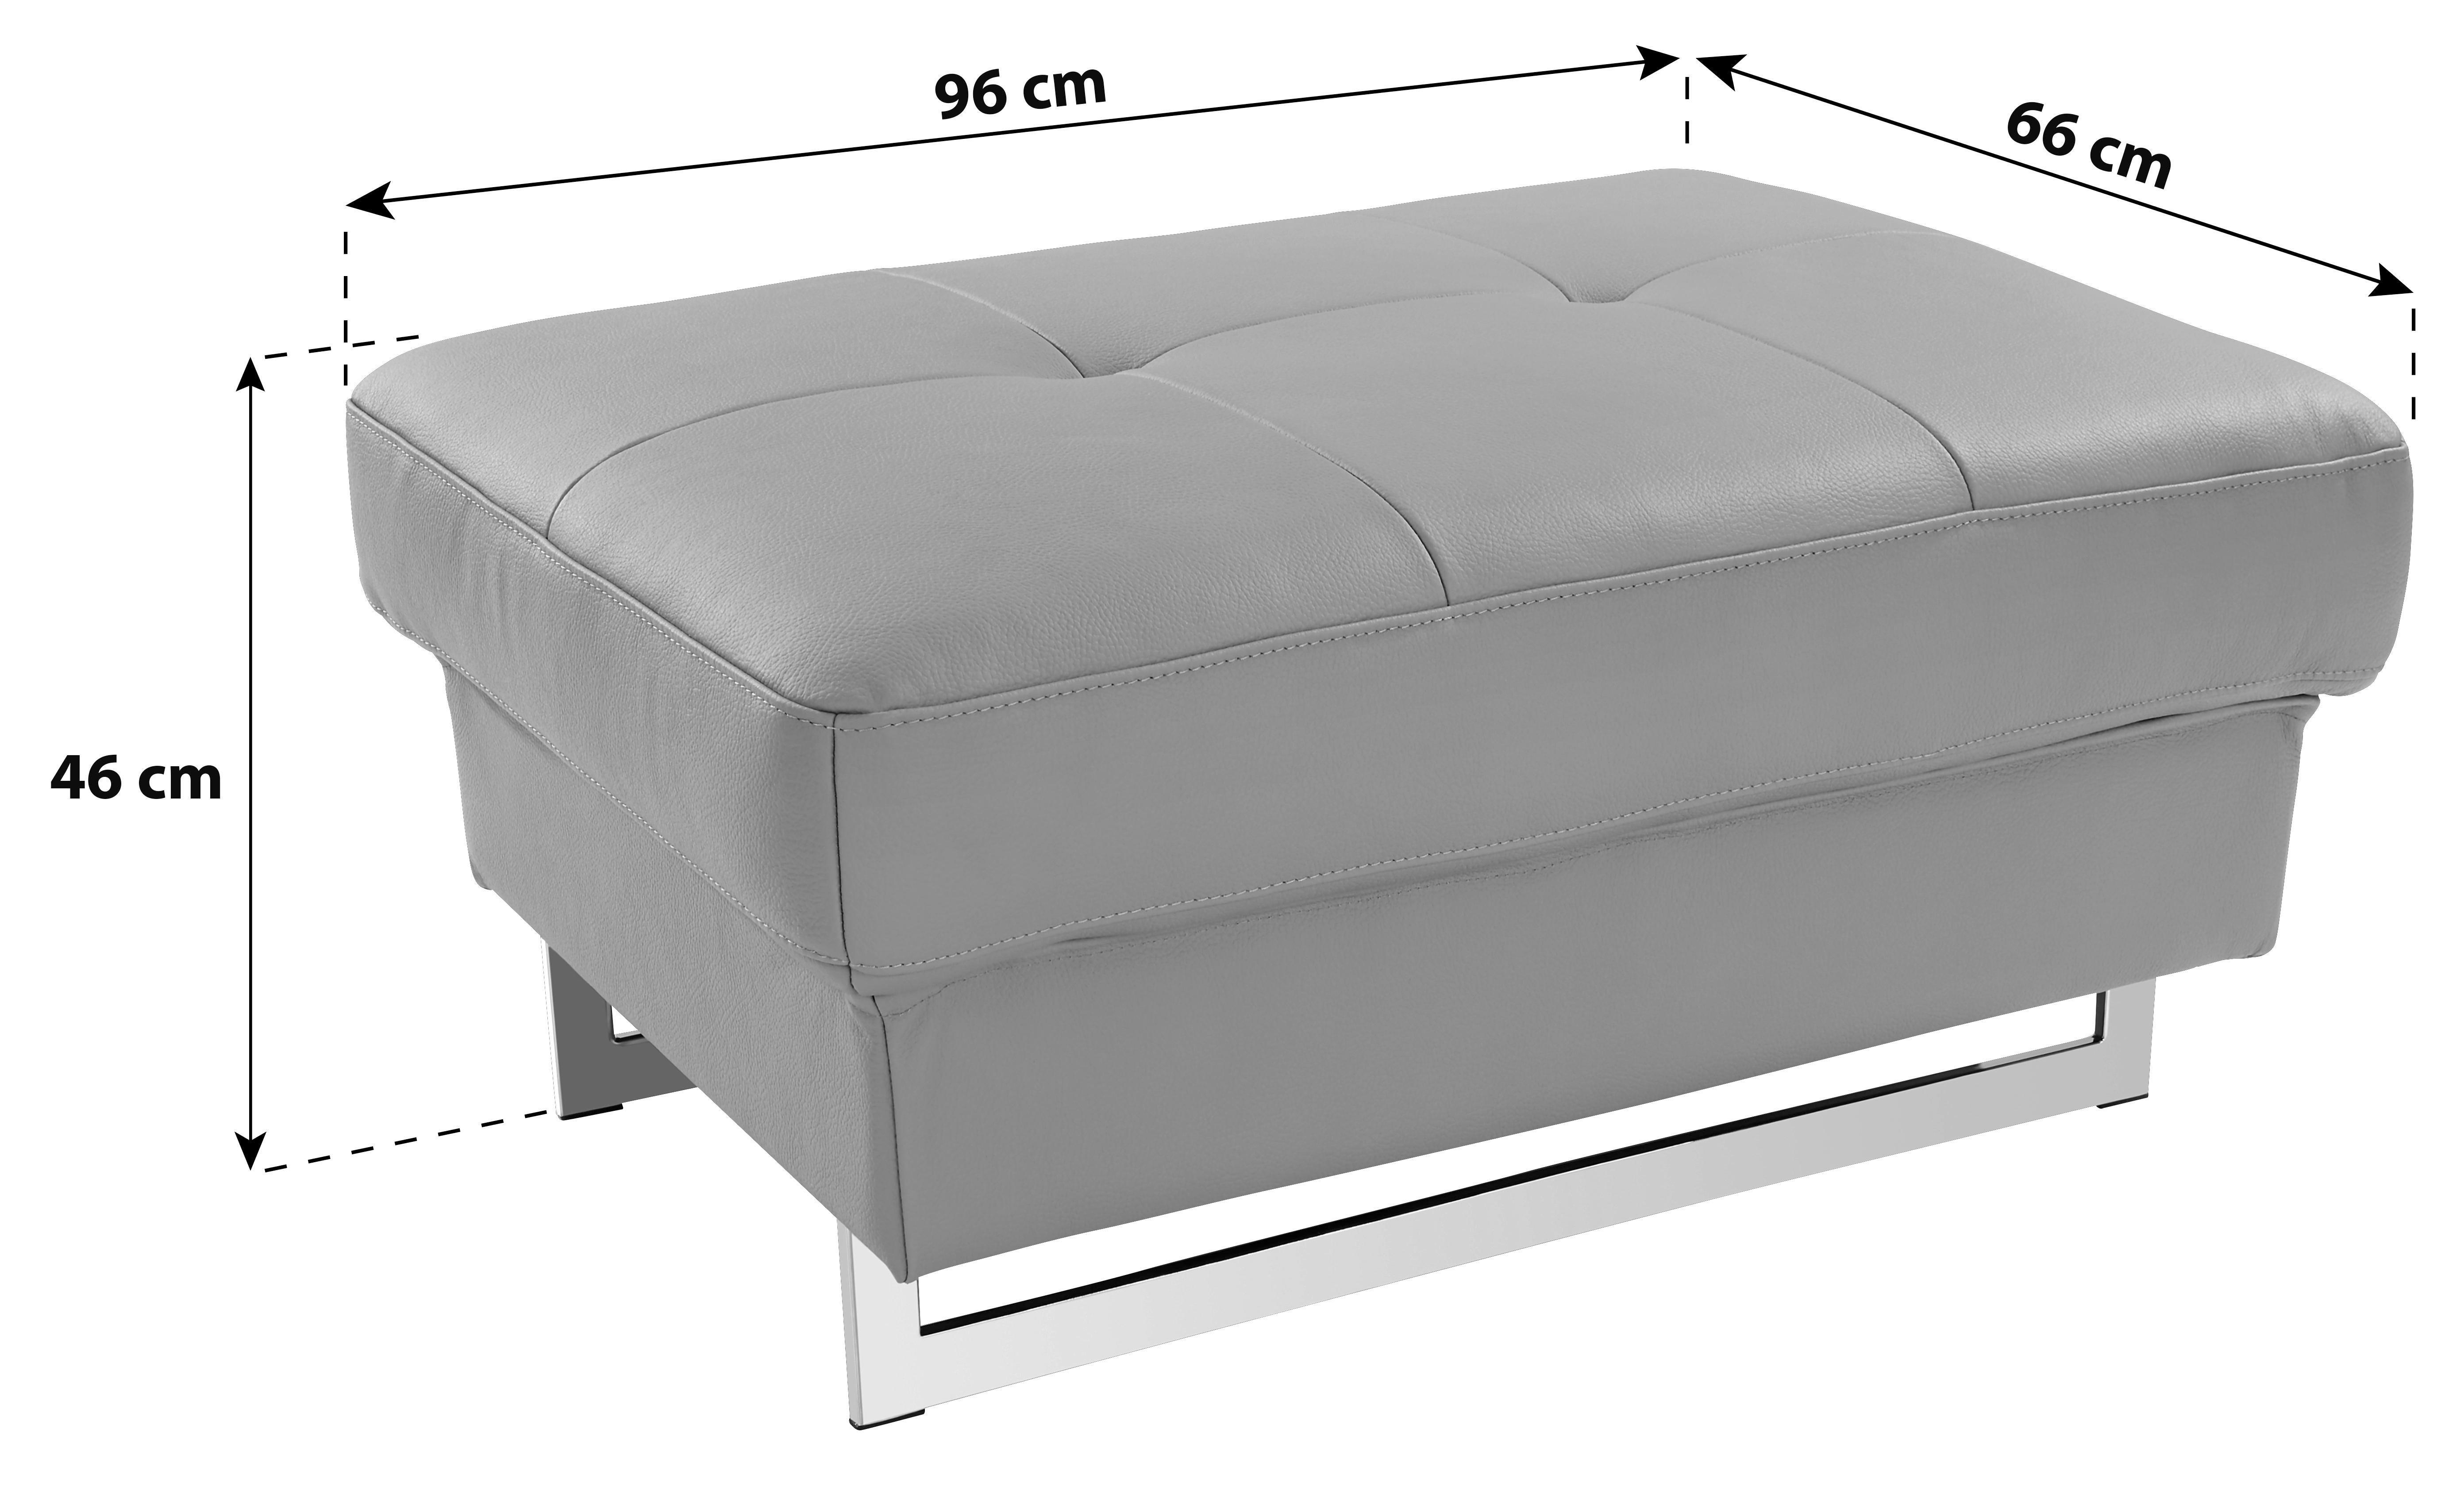 Ülőke Rockstar - homok színű, modern, bőr (96/46/66cm)